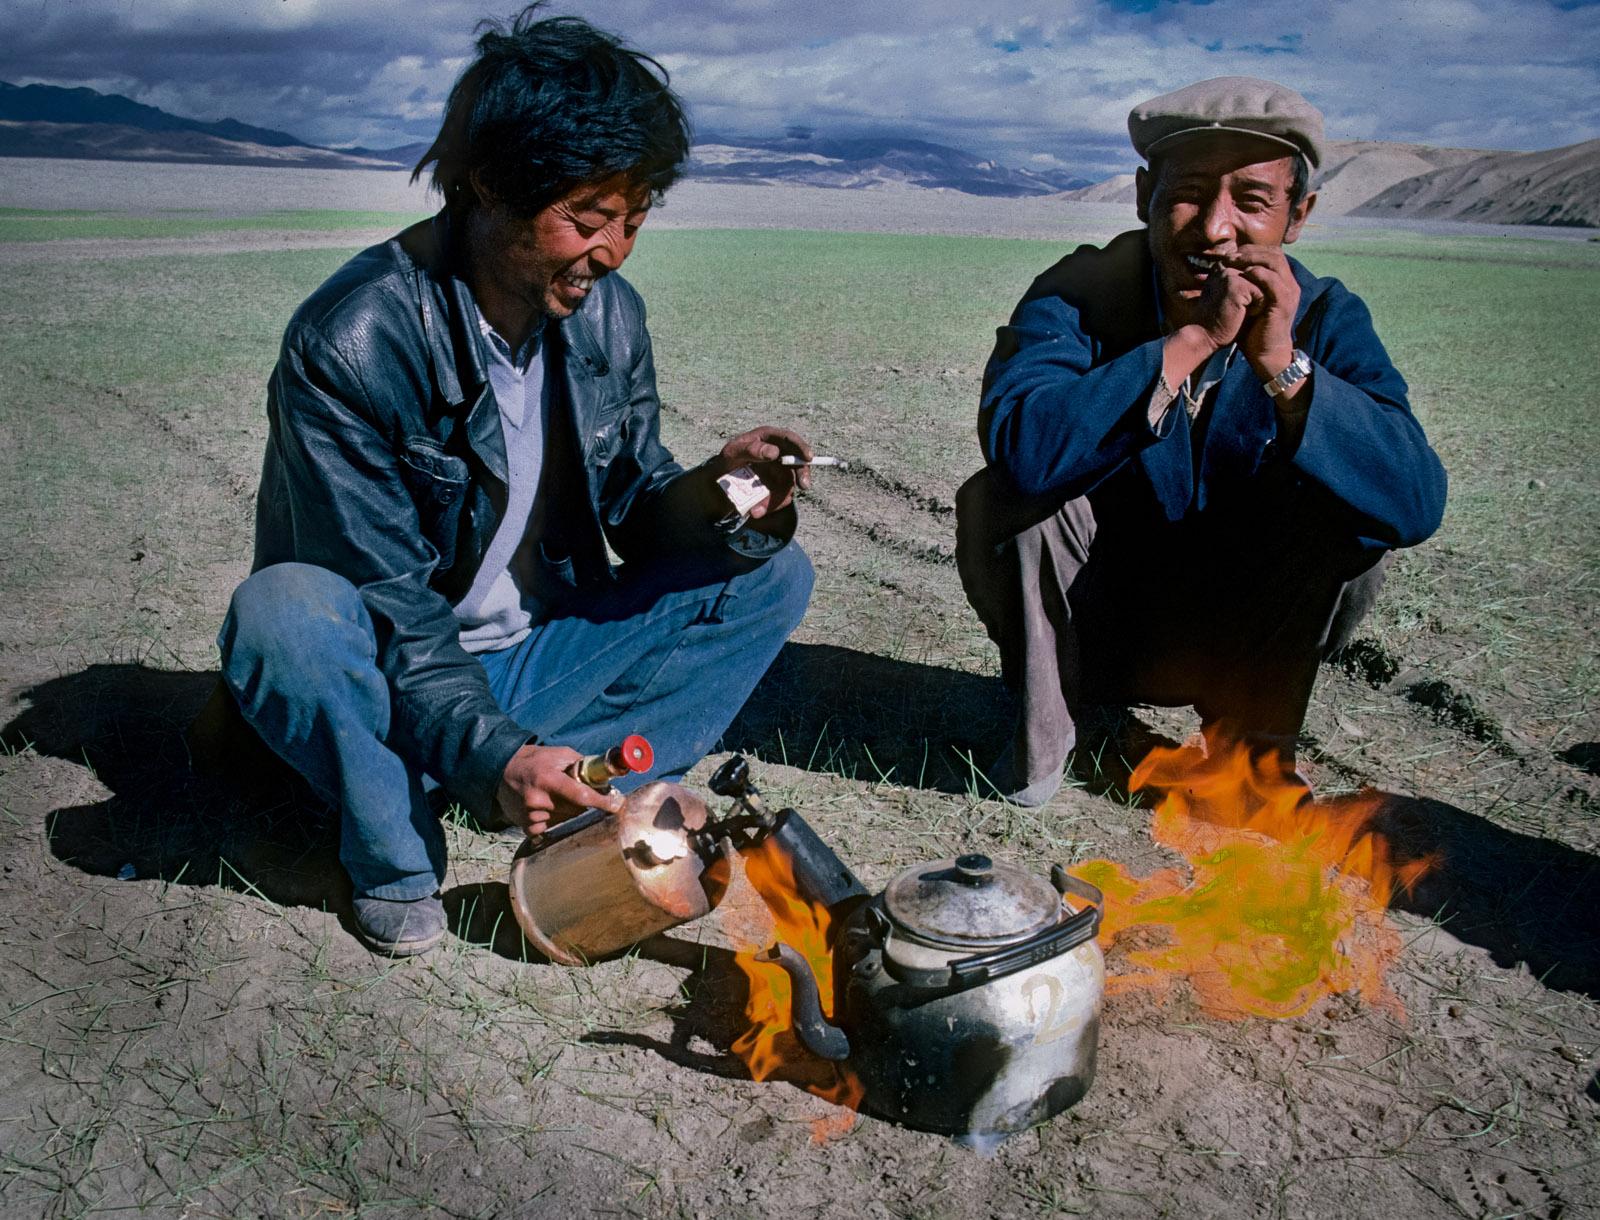 Gyatso, our Tibetan truck driver, brews up a pot of yak butter tea with his tiger torch. Changtang Plateau, Tibet. 1987